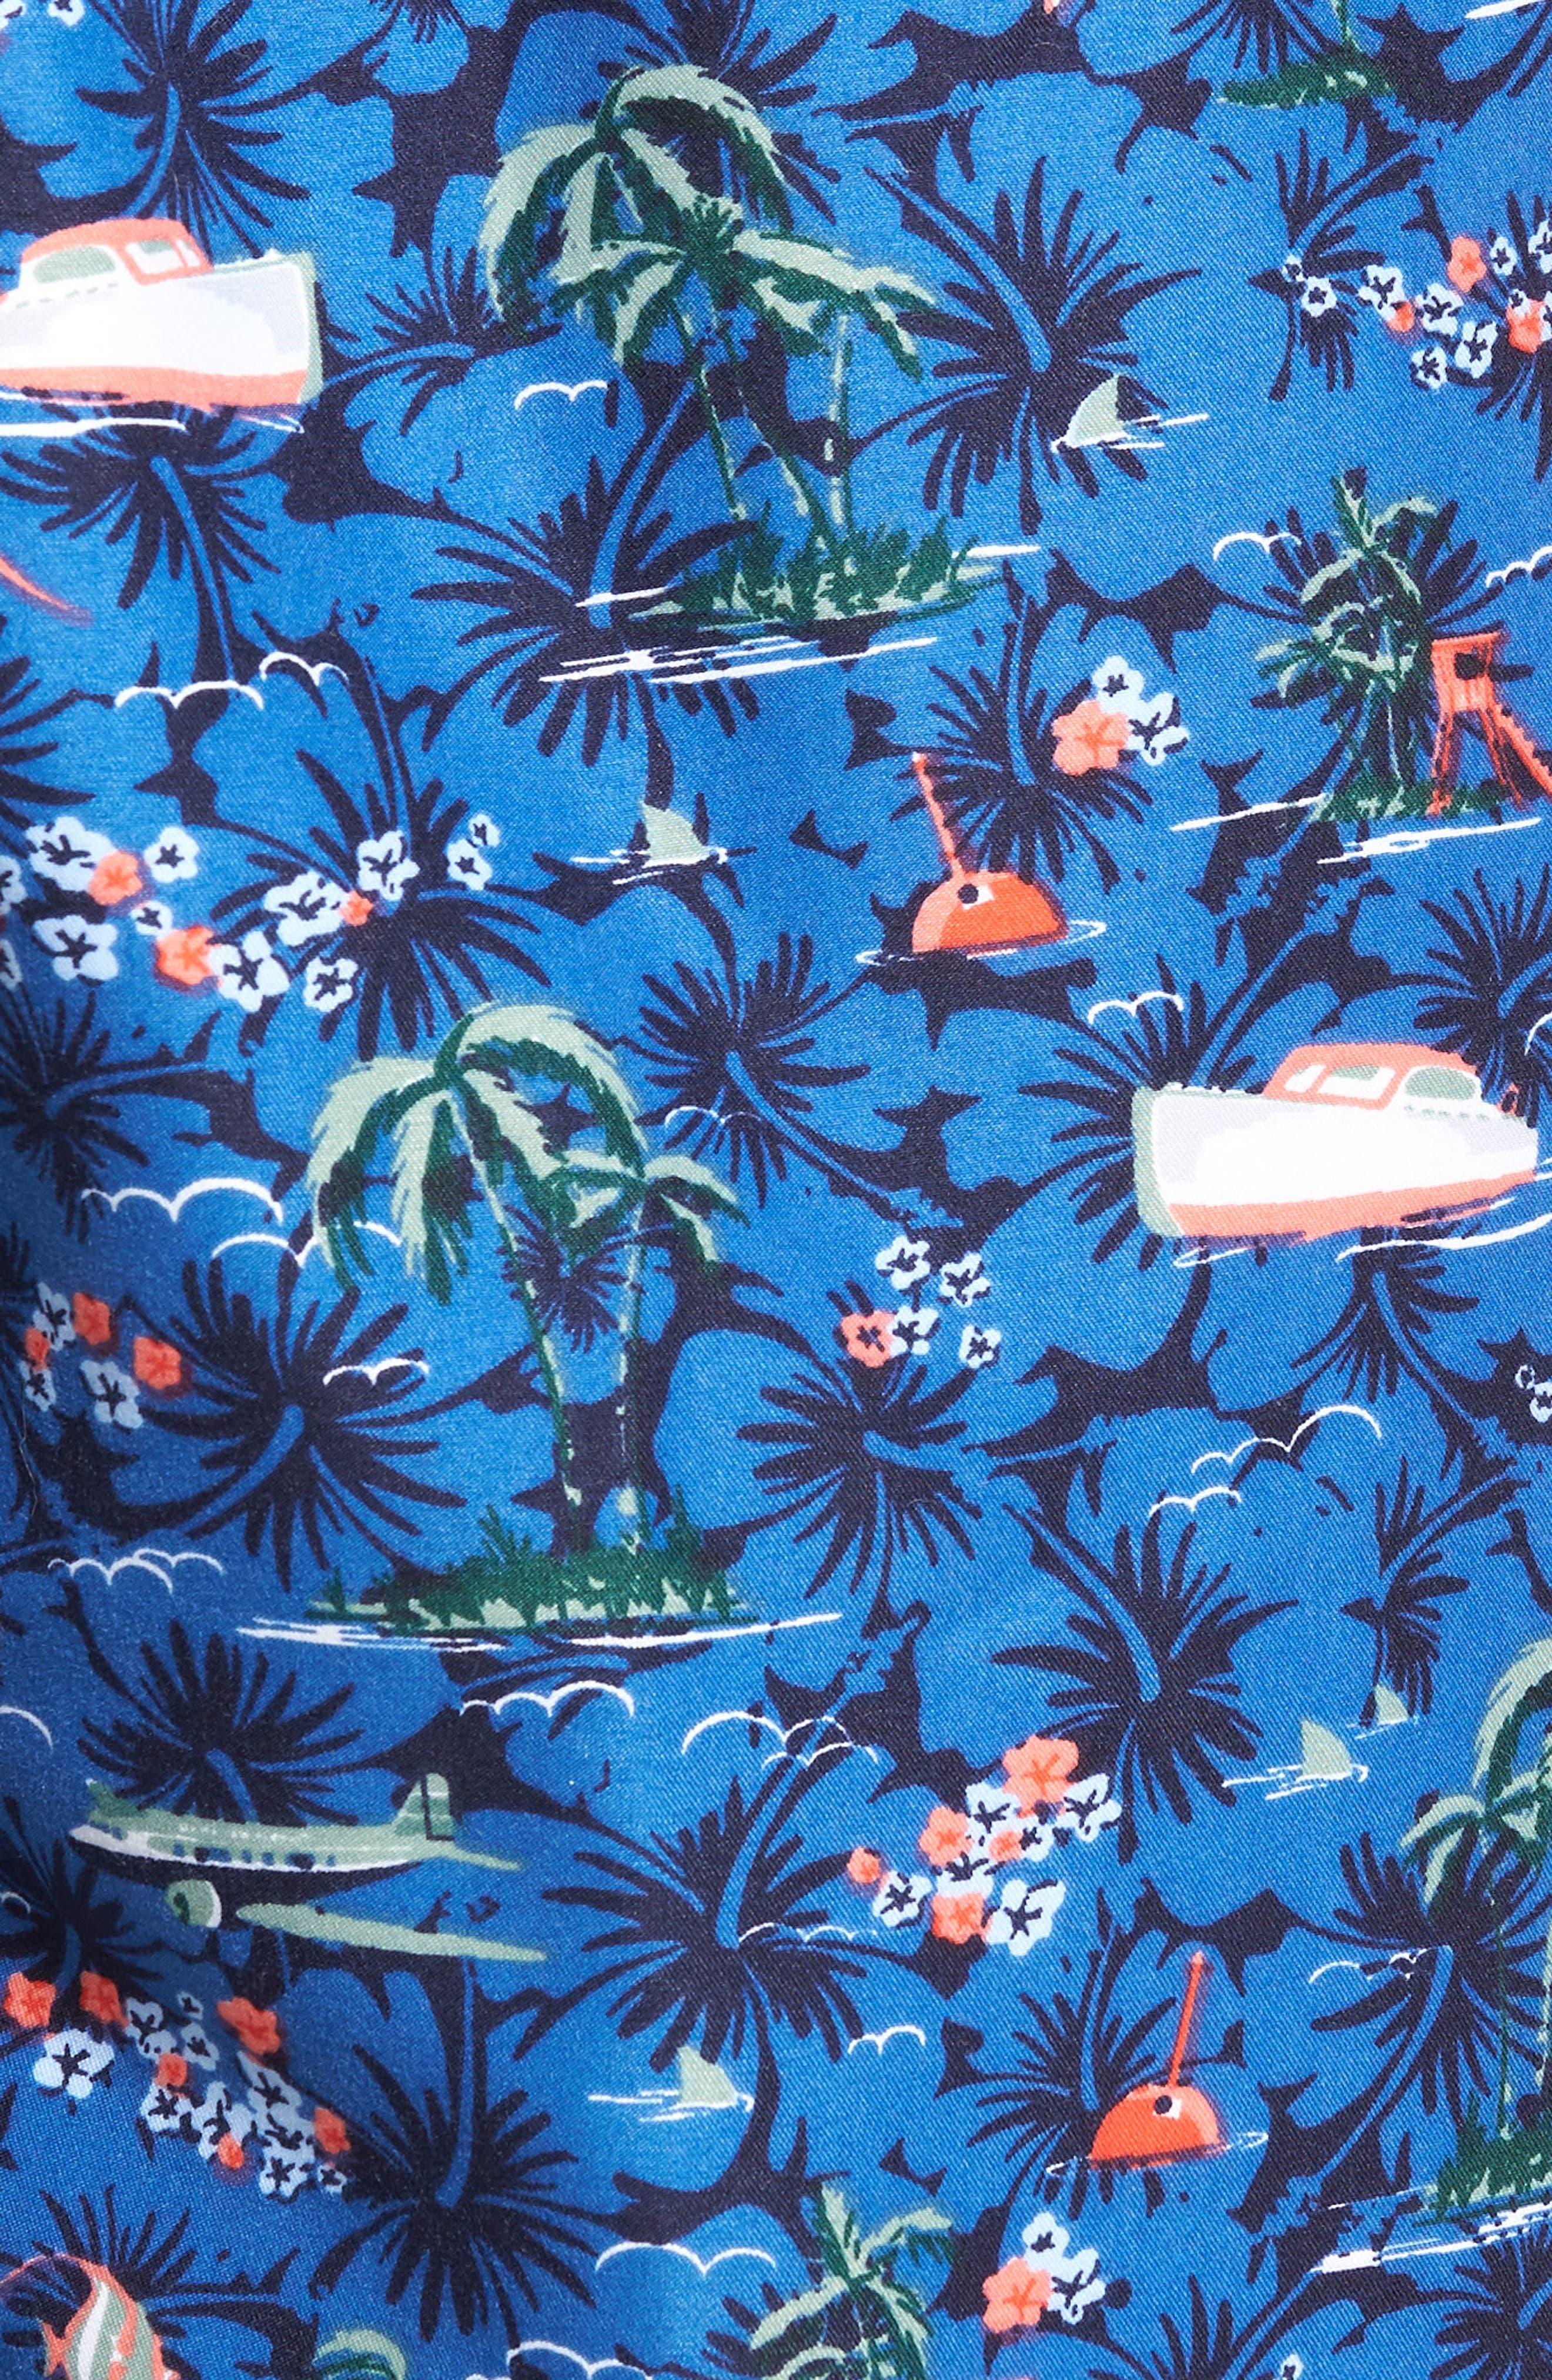 Hawaiian Express Swim Trunks,                             Alternate thumbnail 5, color,                             BLUE